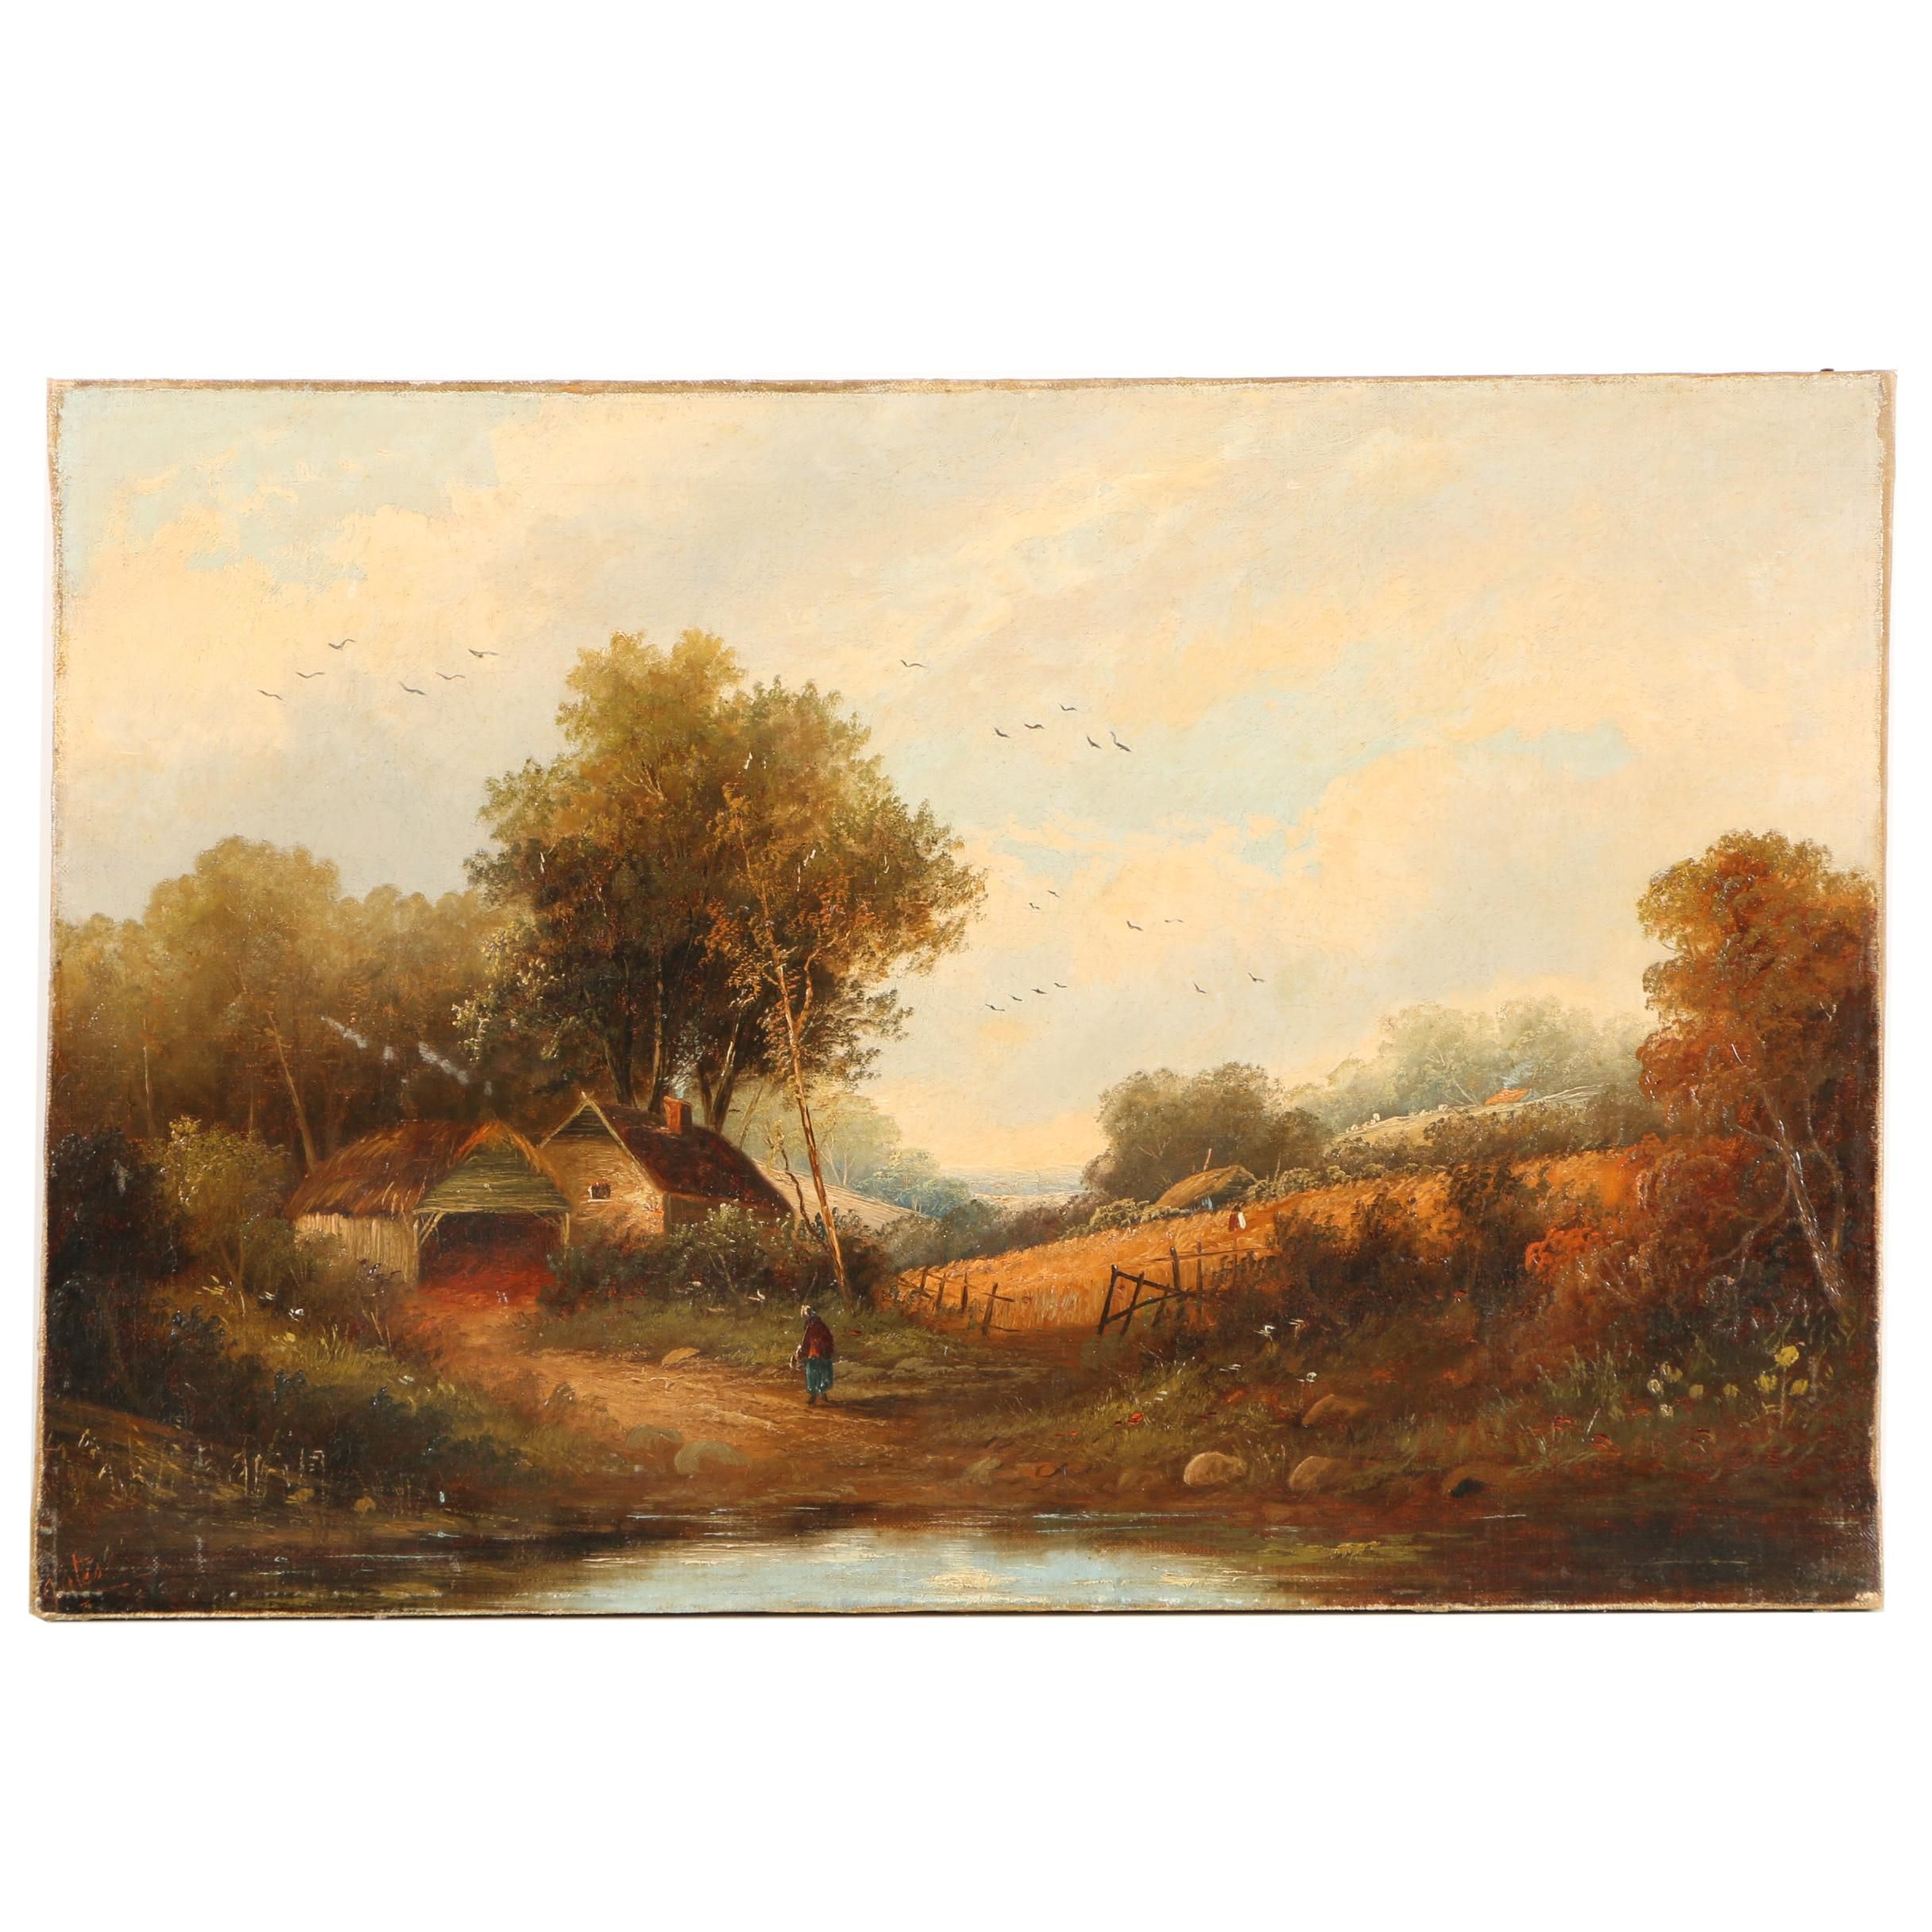 Gates Oil Painting of a Pastoral Landscape